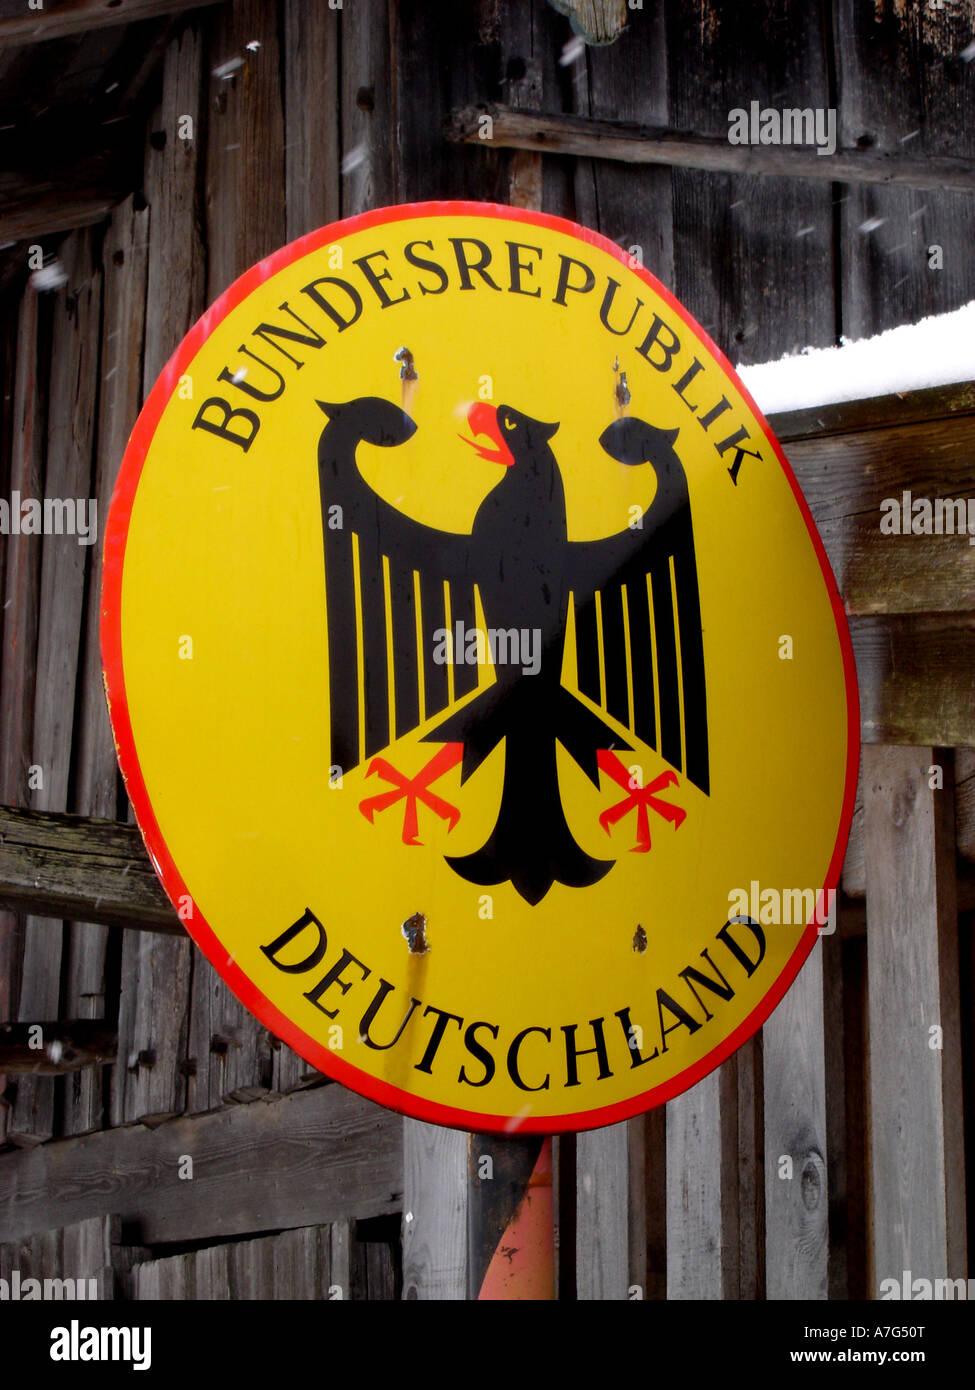 Deutsche Grenze im Schnee German frontier in the snow - Stock Image